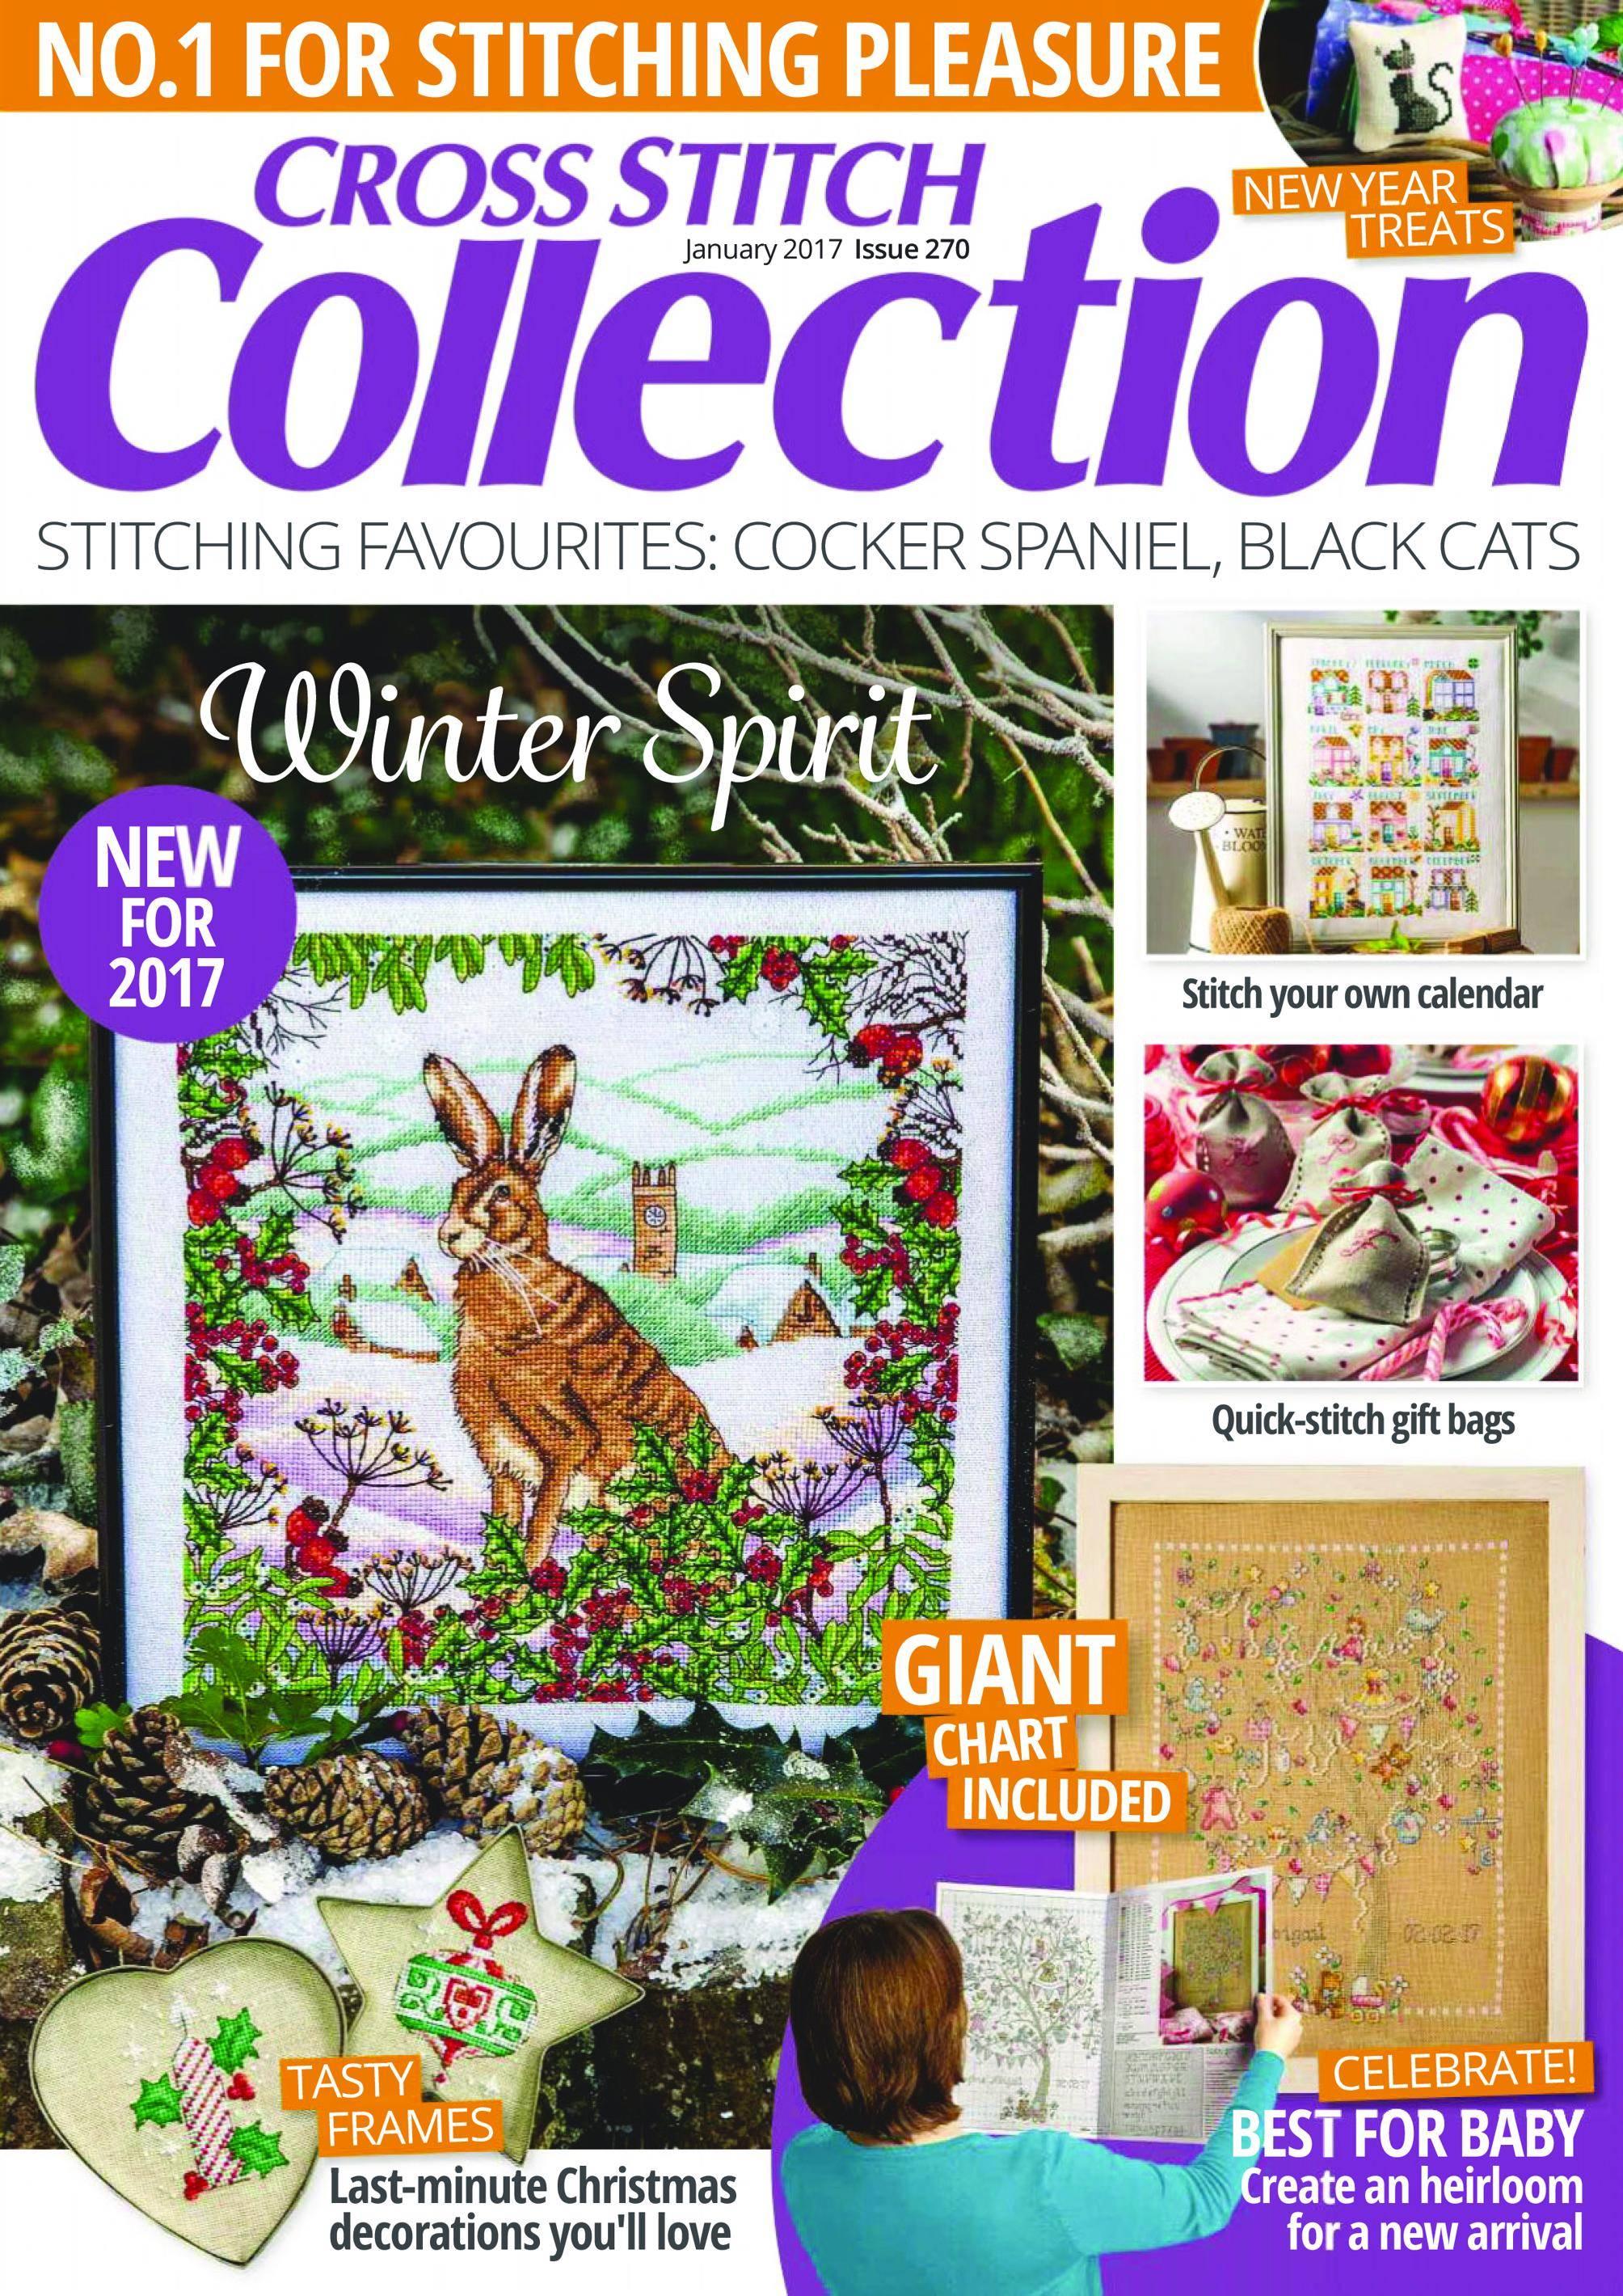 Cross Stitch Collection - January 01, 2017